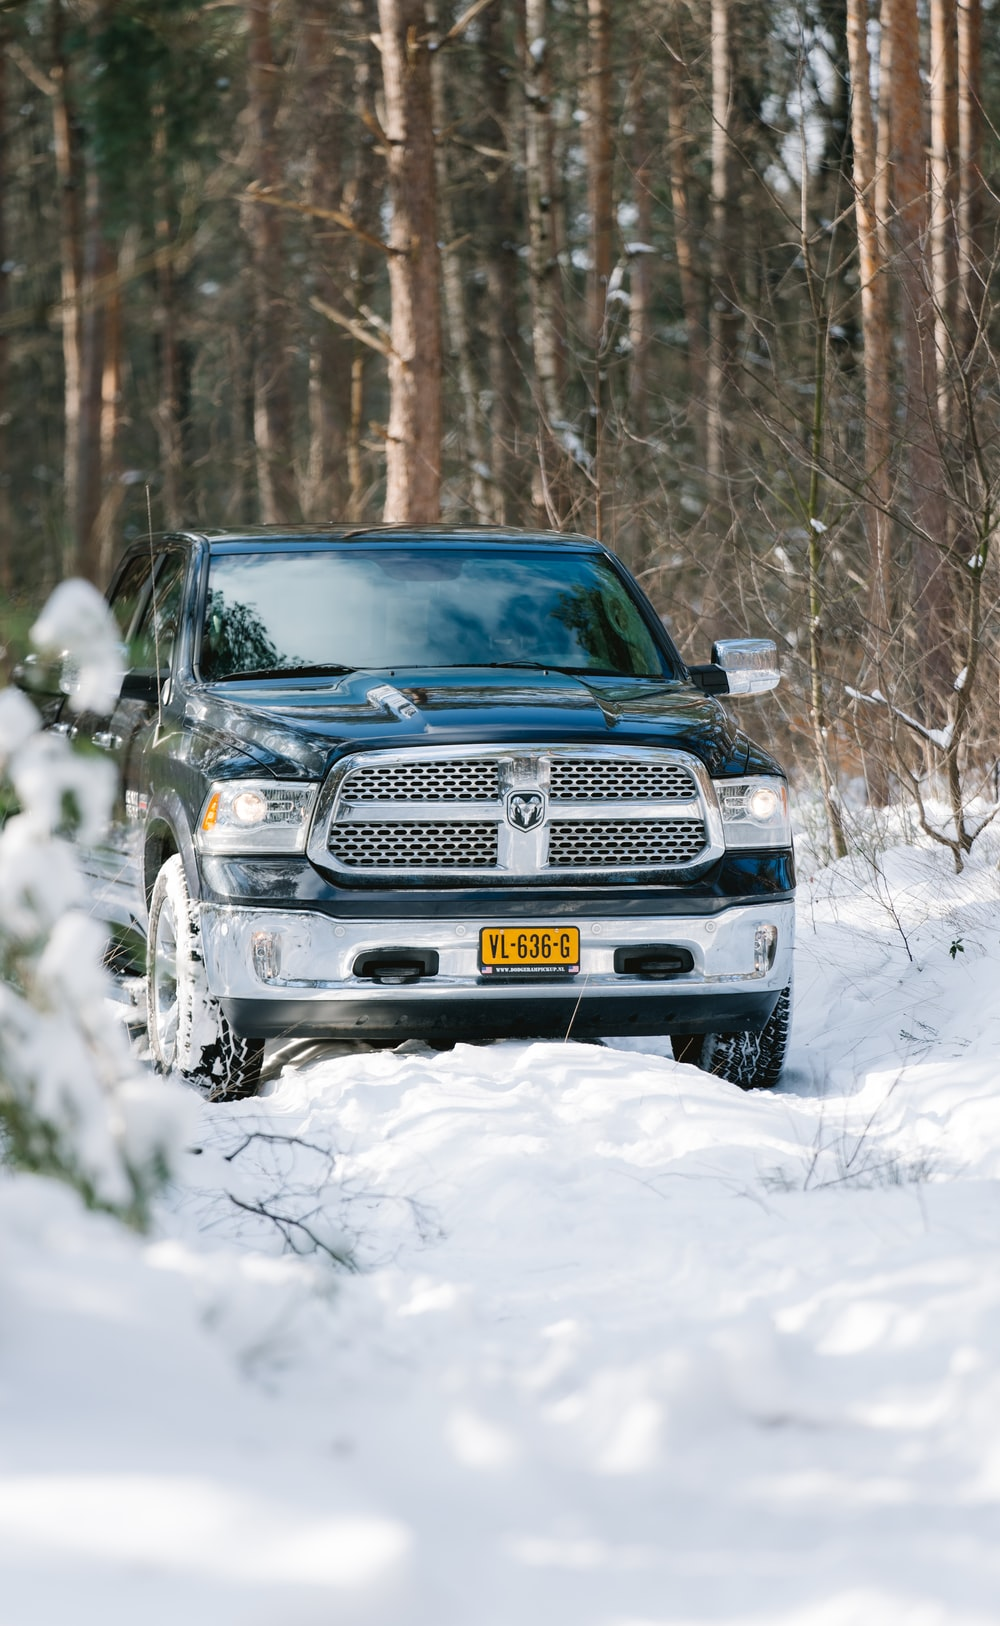 black chevrolet car on snow covered ground during daytime